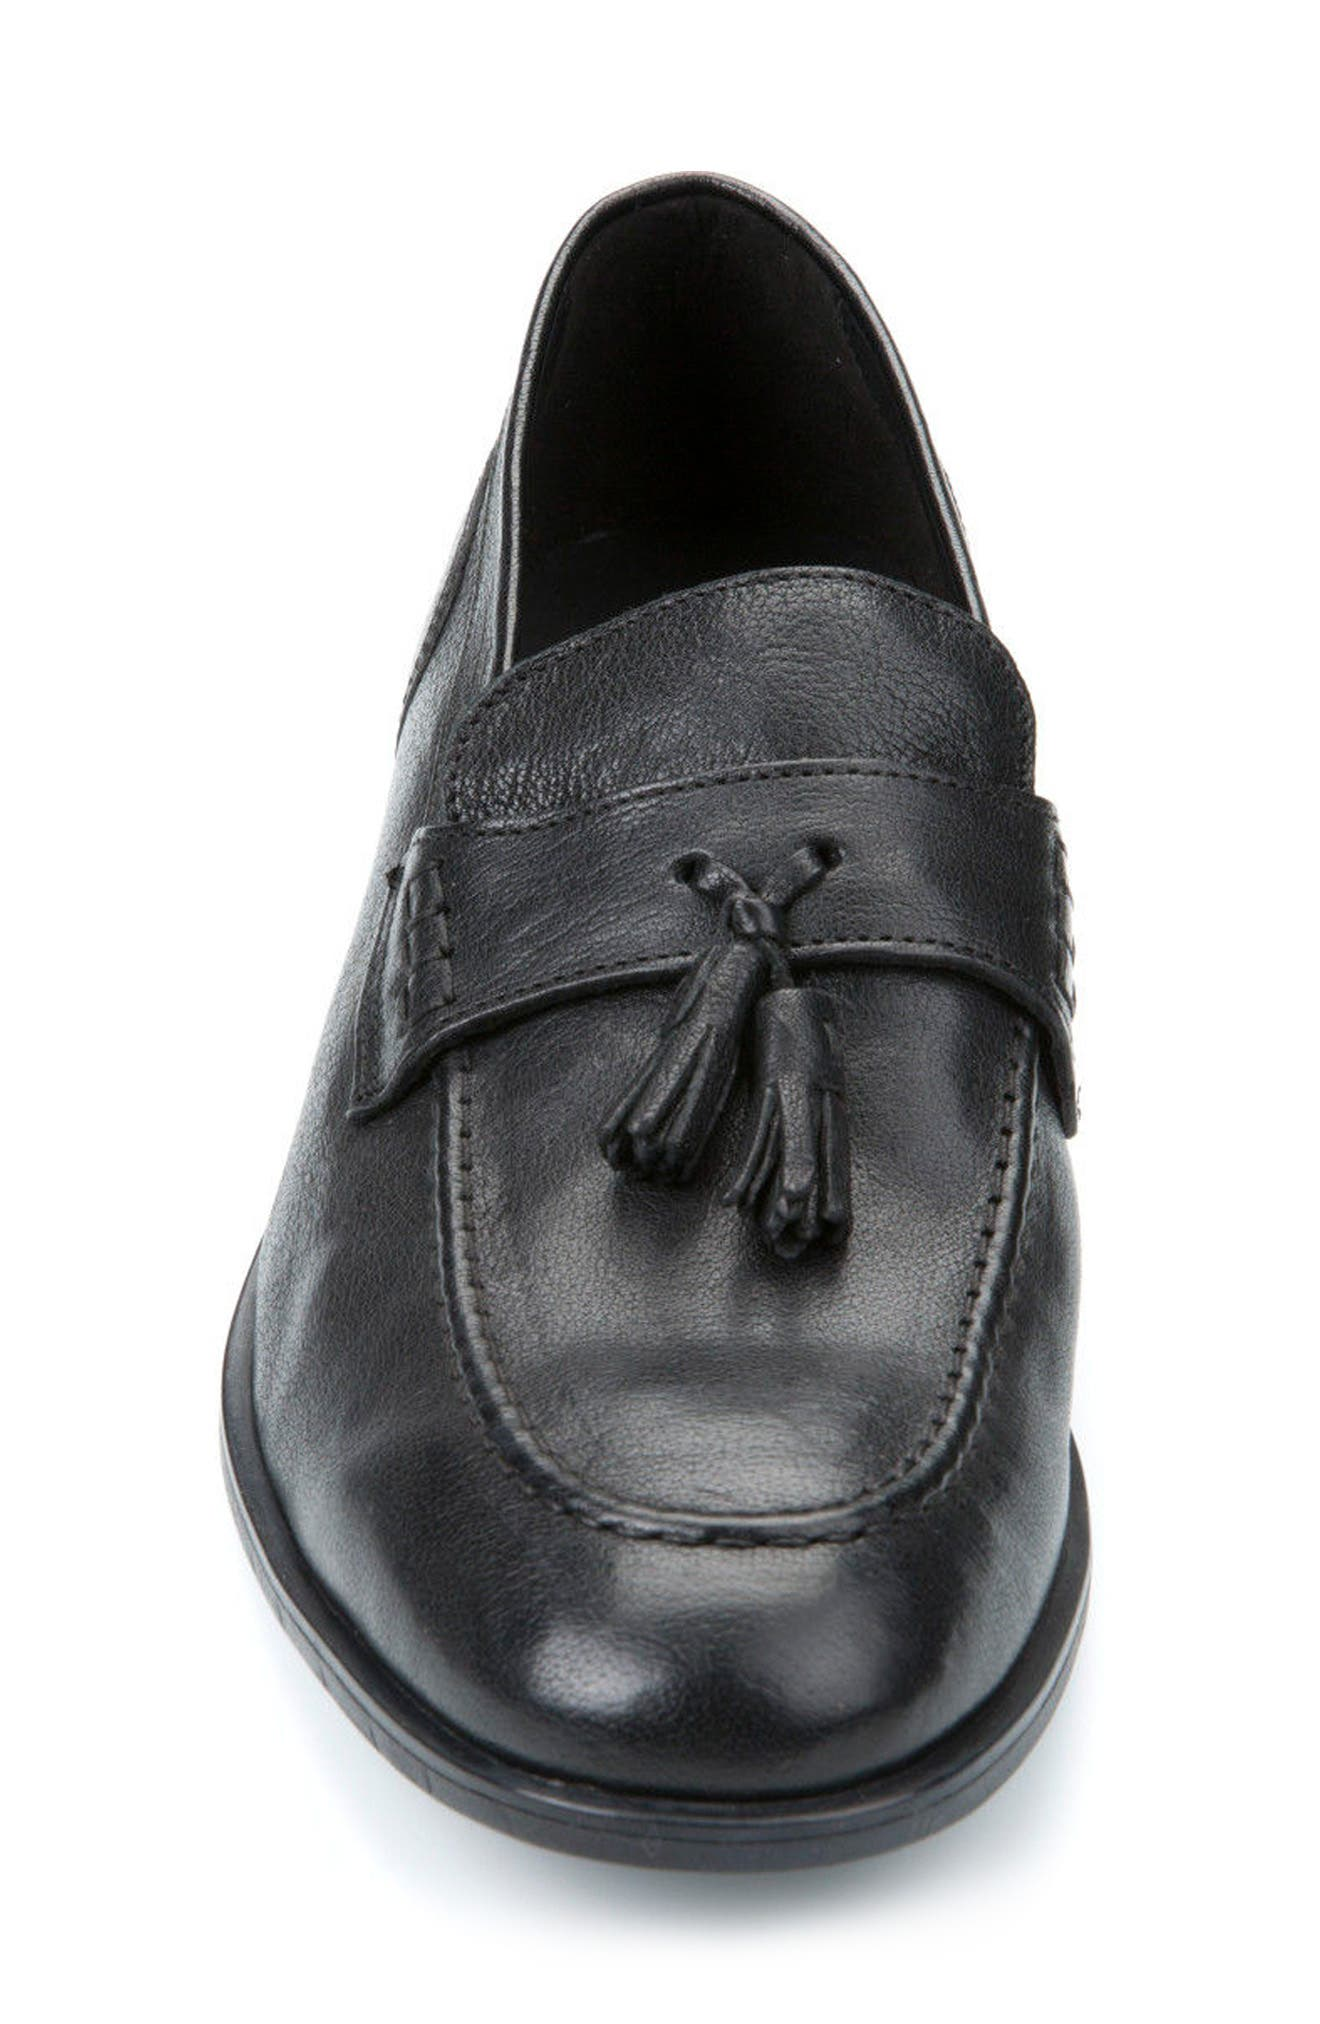 Bryceton 4 Tassel Loafer,                             Alternate thumbnail 4, color,                             BLACK LEATHER